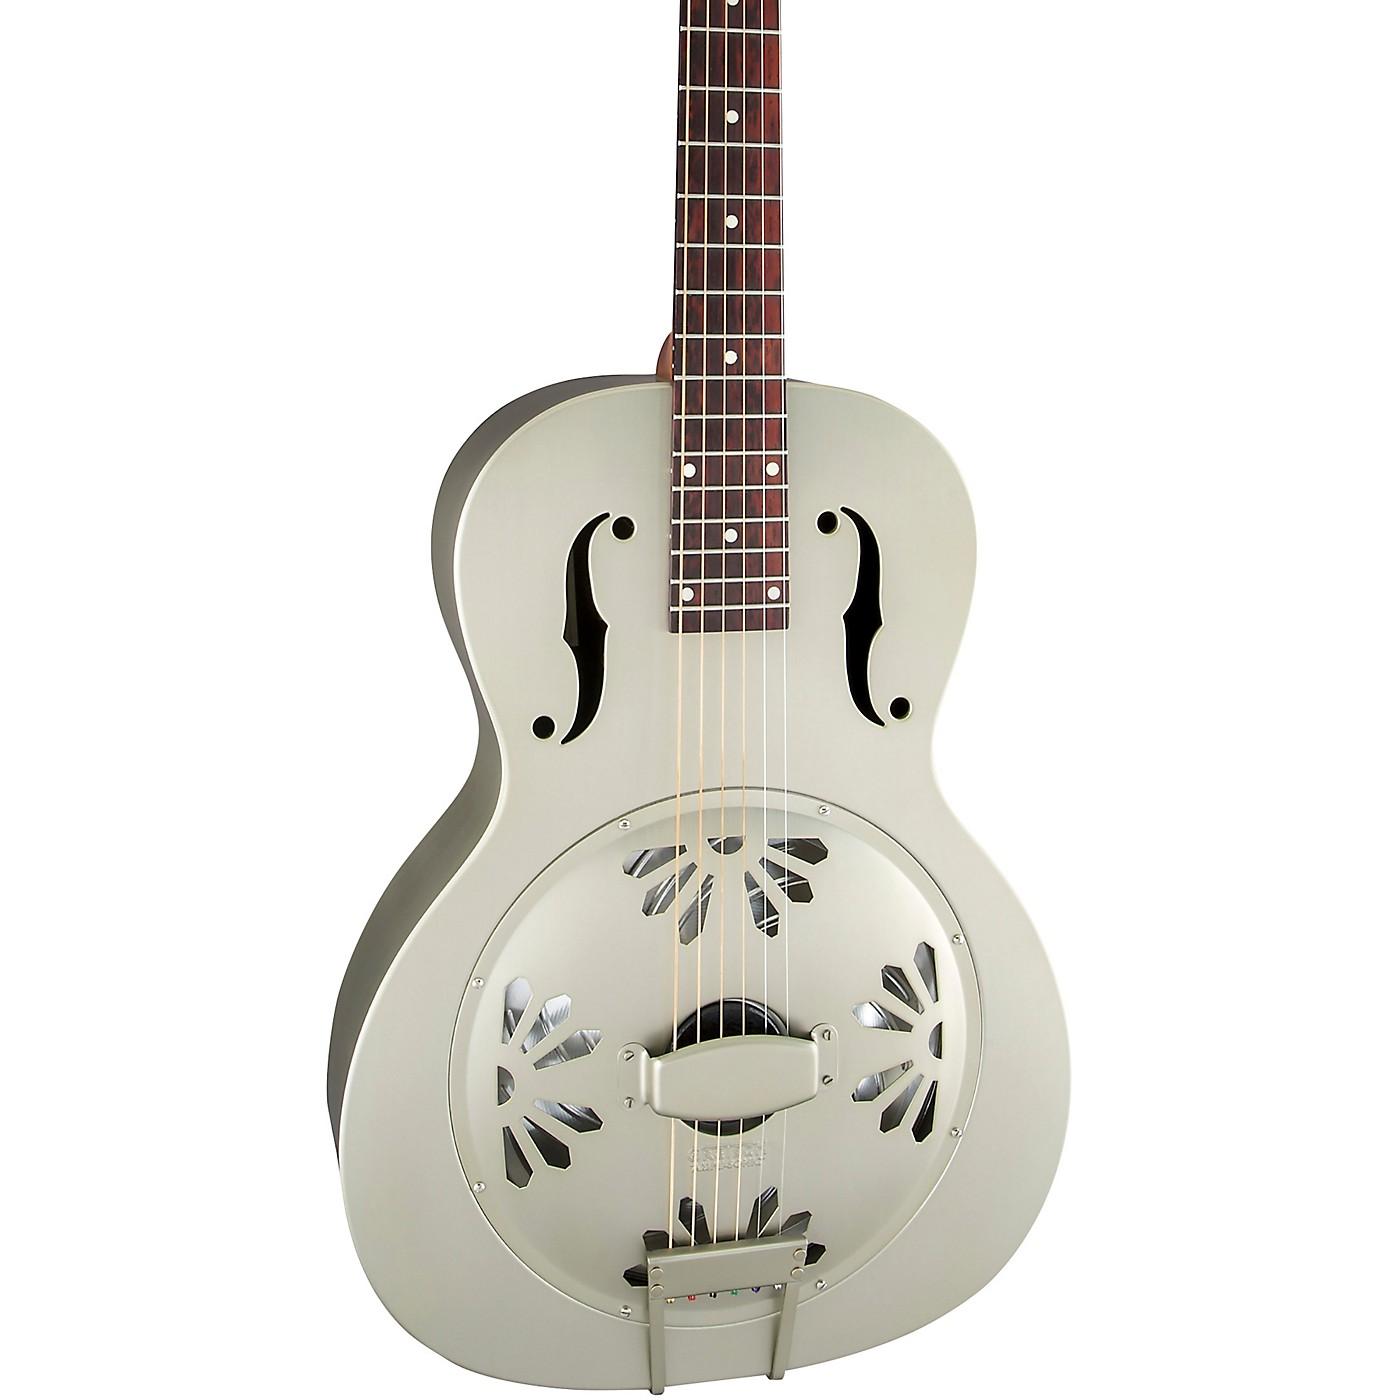 Gretsch Guitars G9201 Honey Dipper Round-Neck, Brass Body Biscuit Cone Resonator Guitar thumbnail